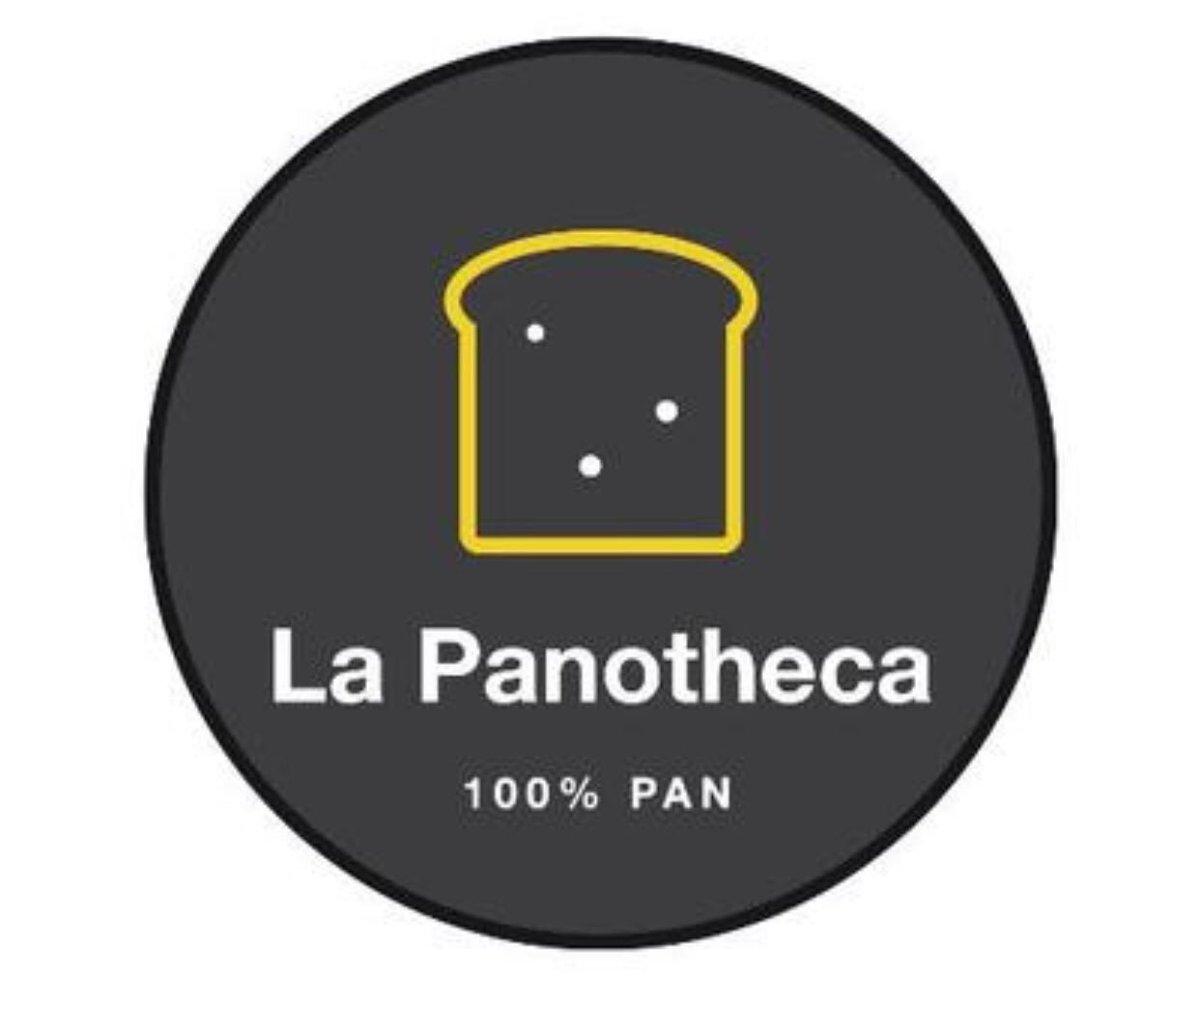 test Twitter Media - Oferta de #empleo: @La_Panotheca busca Panadero/a con experiencia. Es tu oportunidad. Interesados enviar CV a info@lapanotheca.com. https://t.co/r0vCp0S5QC